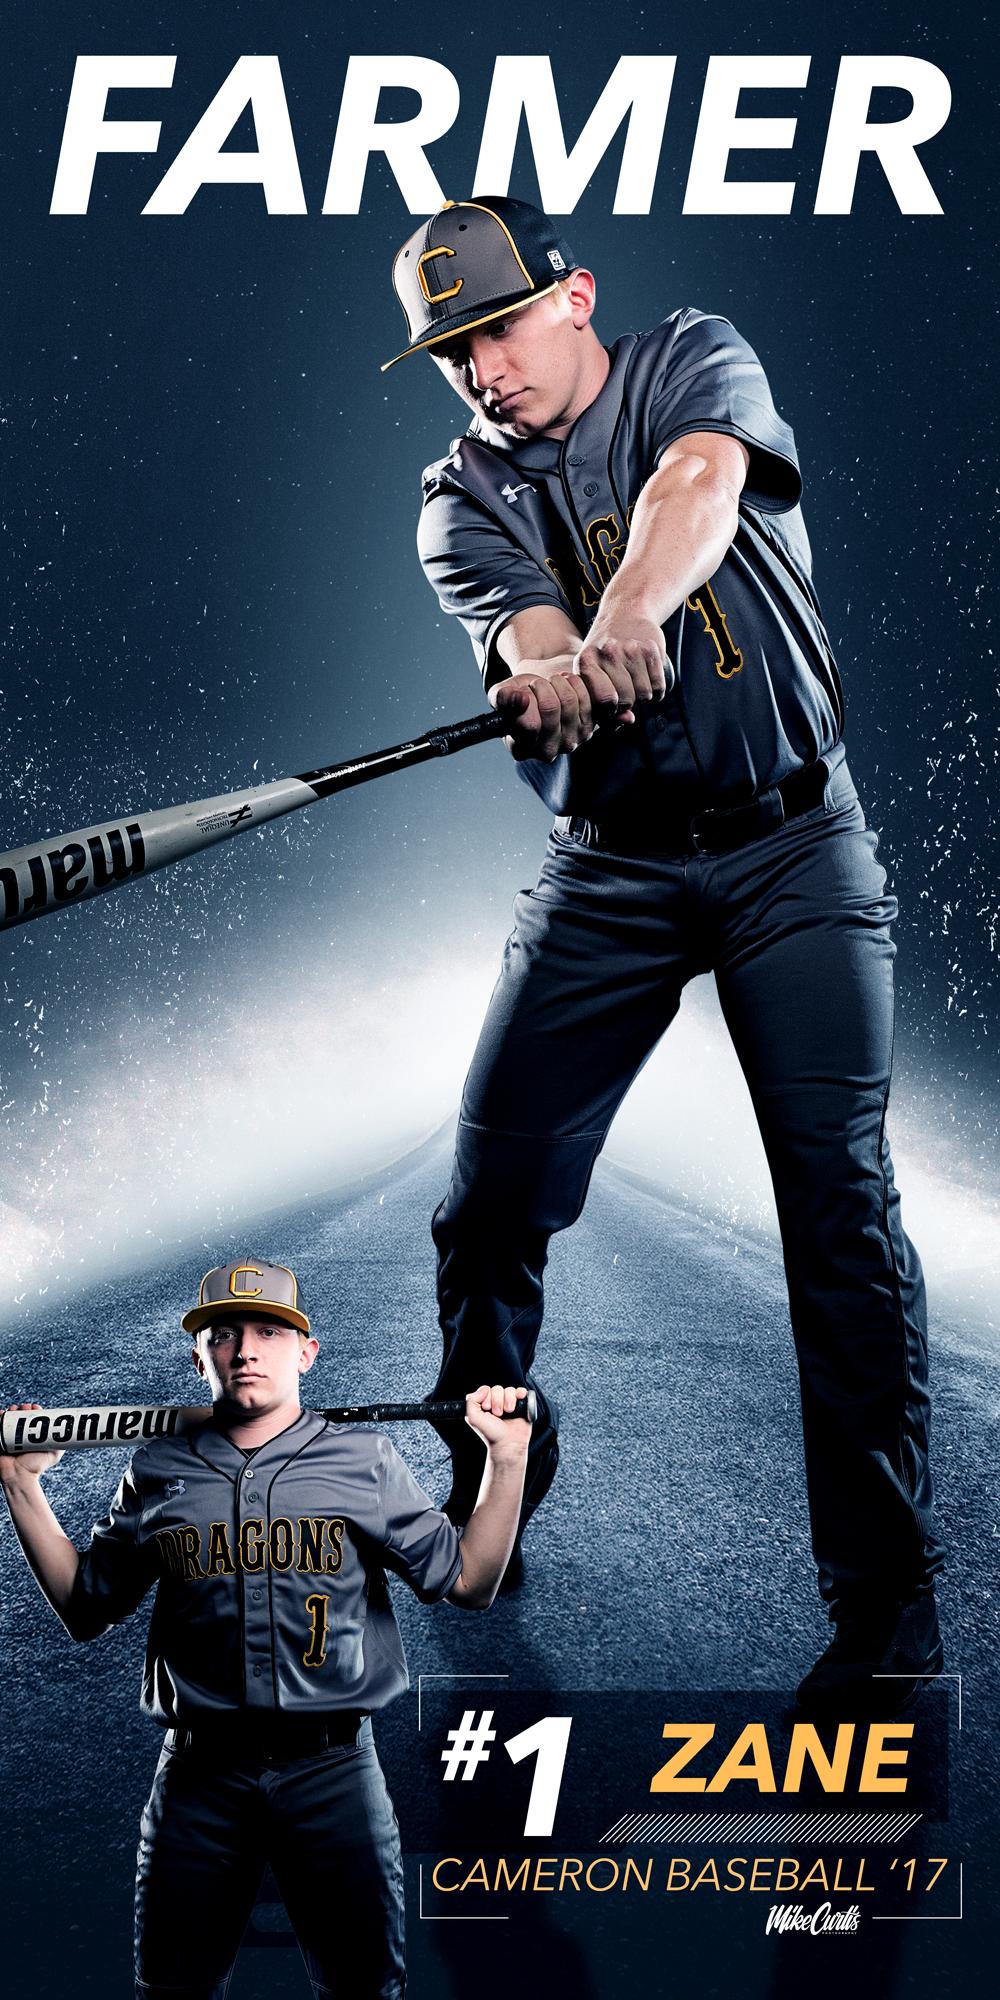 CHS-Baseball-17_Farmer_2x4-Banner.jpg